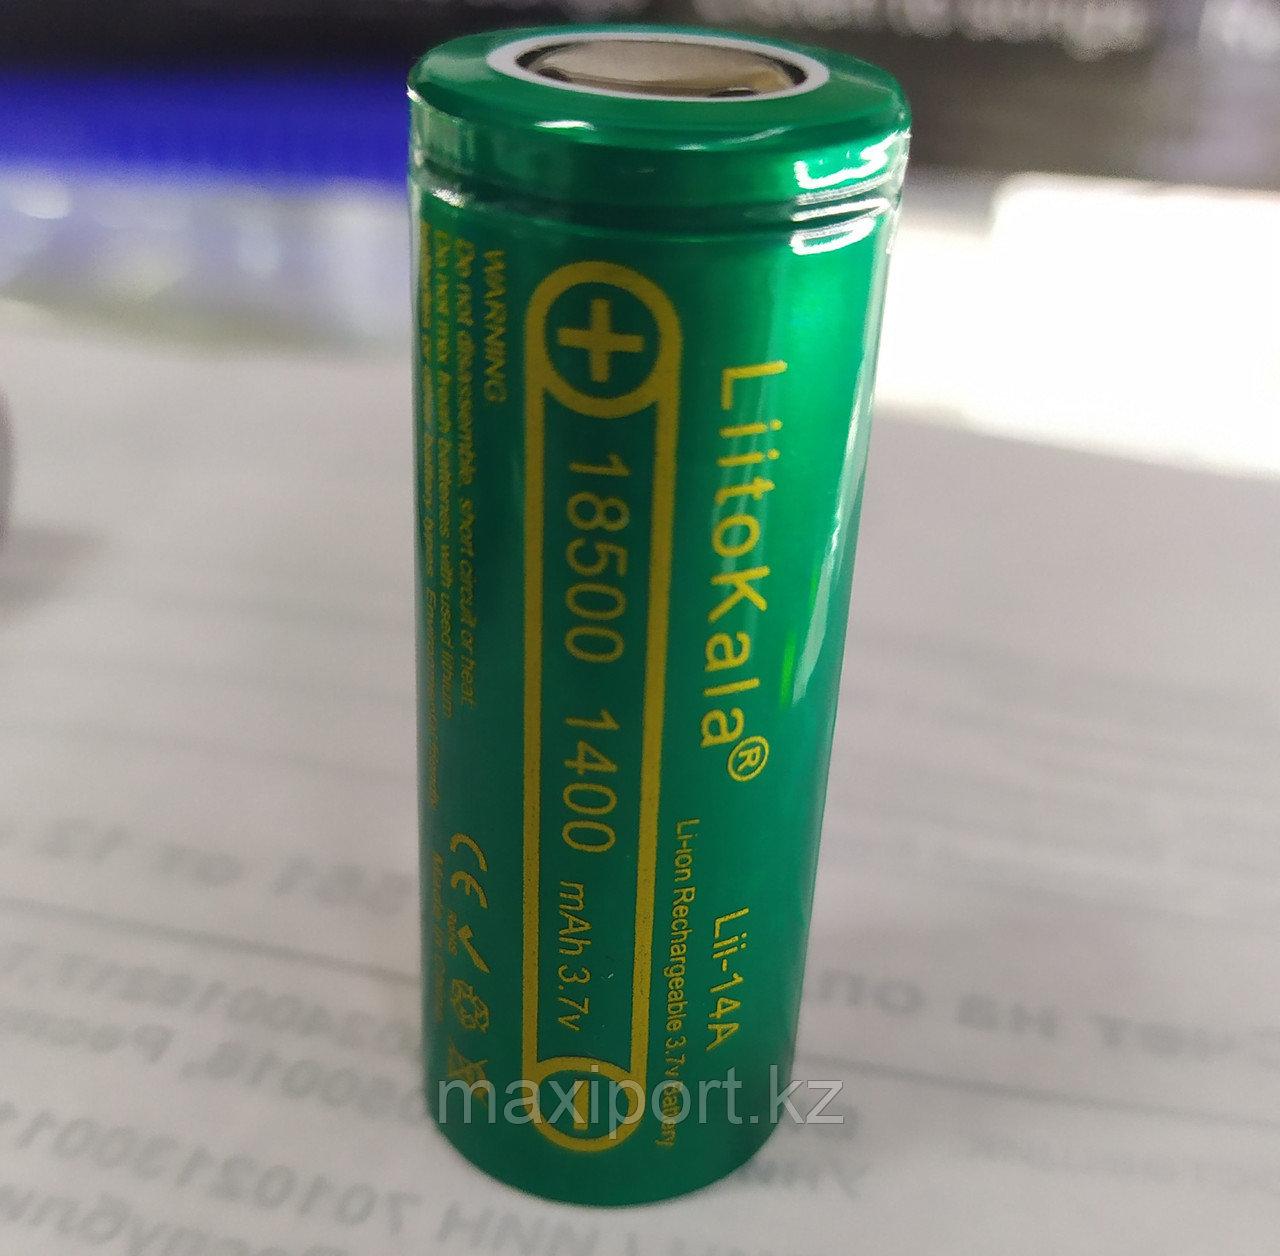 18500 3.7v 1400mah аккумулятор для бритв и эпиляторов (braun)